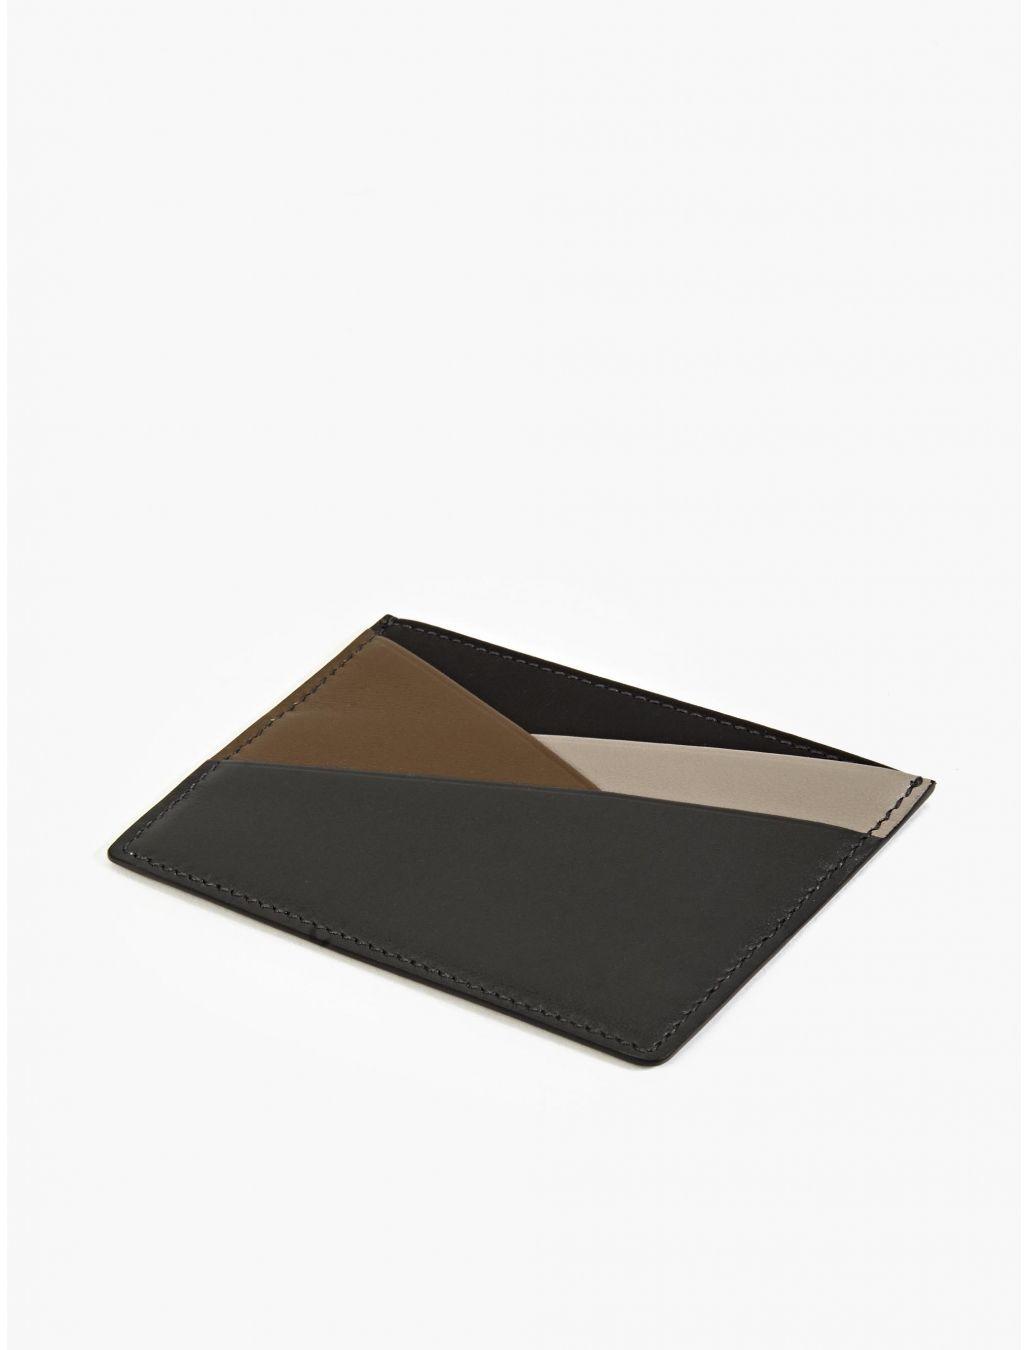 Smythson menus charcoal leather card holder okini Кожаные вещи